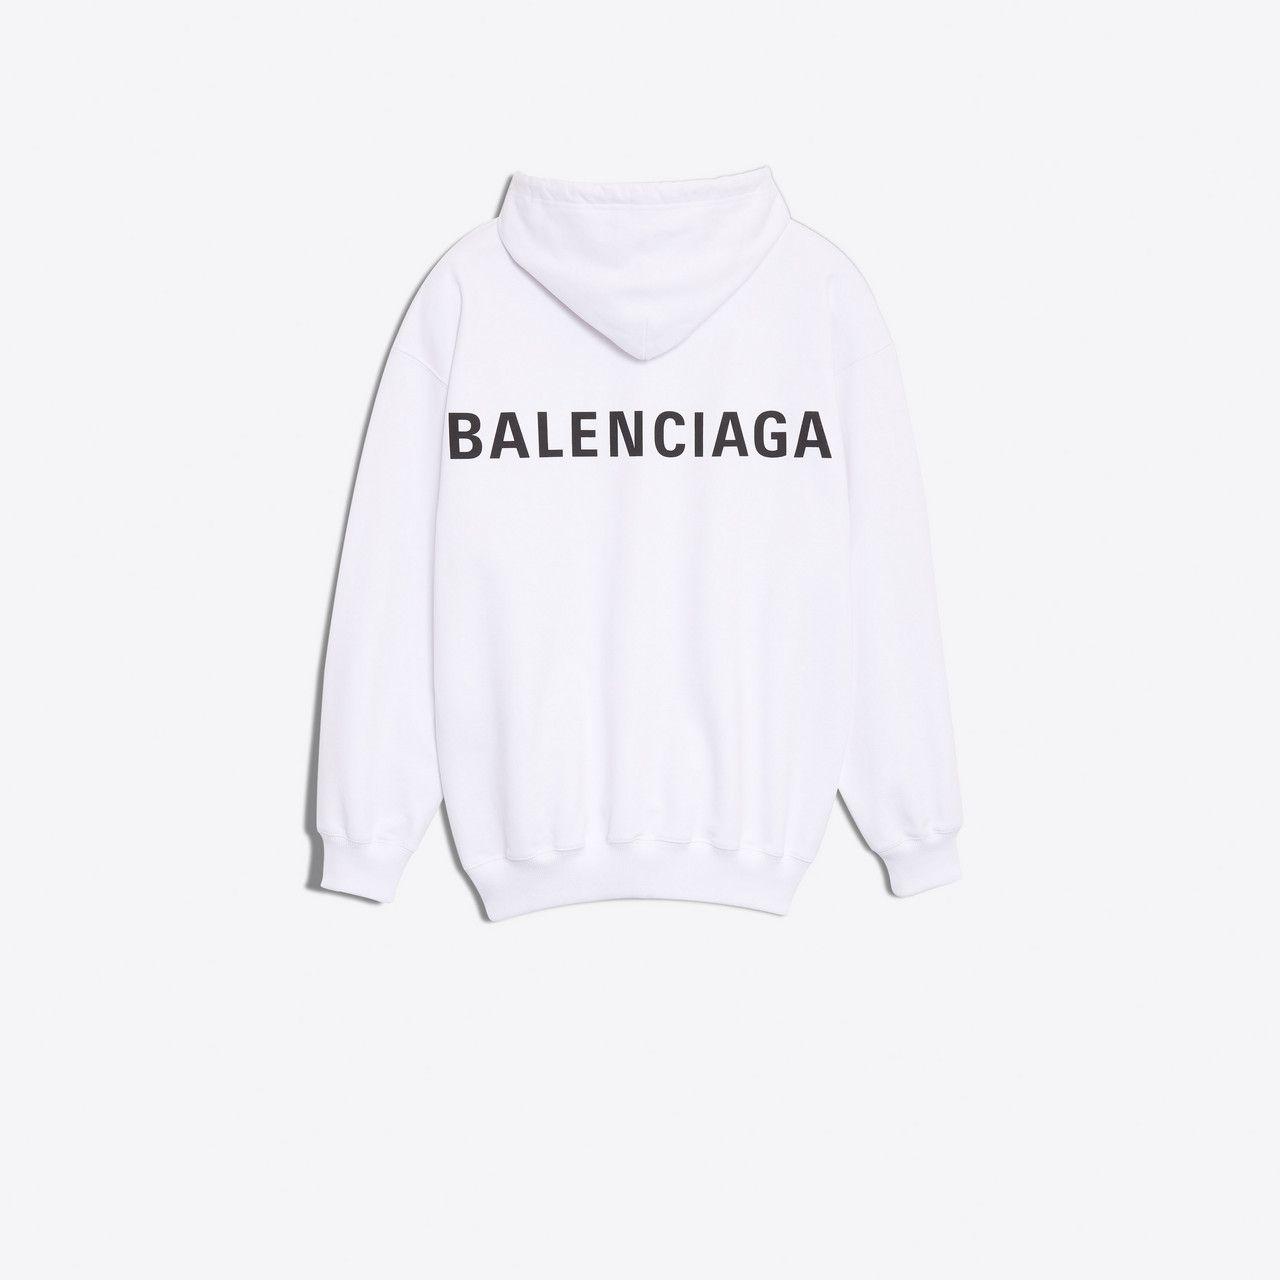 Balenciaga Logo Hoodie Sweater Jersey Woman D Sweater Hoodie Black And White Hoodies Sweatshirts [ 1280 x 1280 Pixel ]